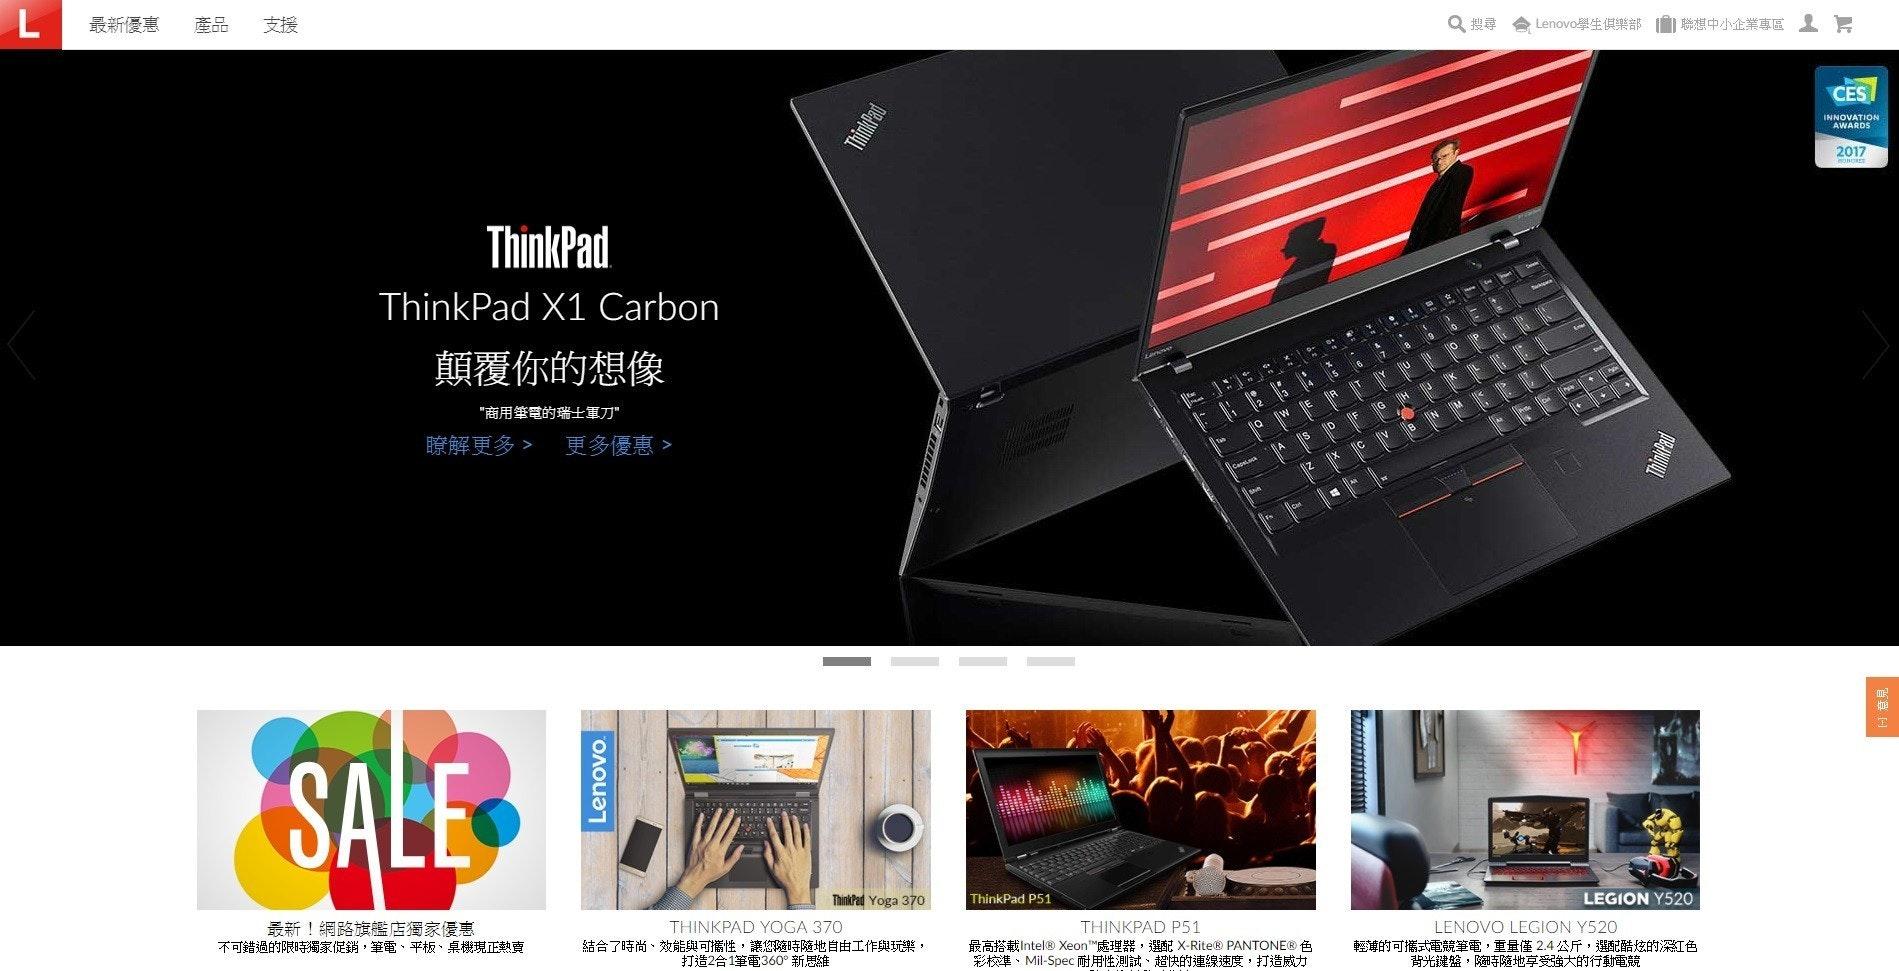 Netbook, Laptop, Lenovo ThinkPad, Hewlett-Packard, , Lenovo, Computer hardware, Computer, Intel Core, , multimedia, laptop, product, multimedia, product, product design, technology, computer hardware, website, brand, netbook